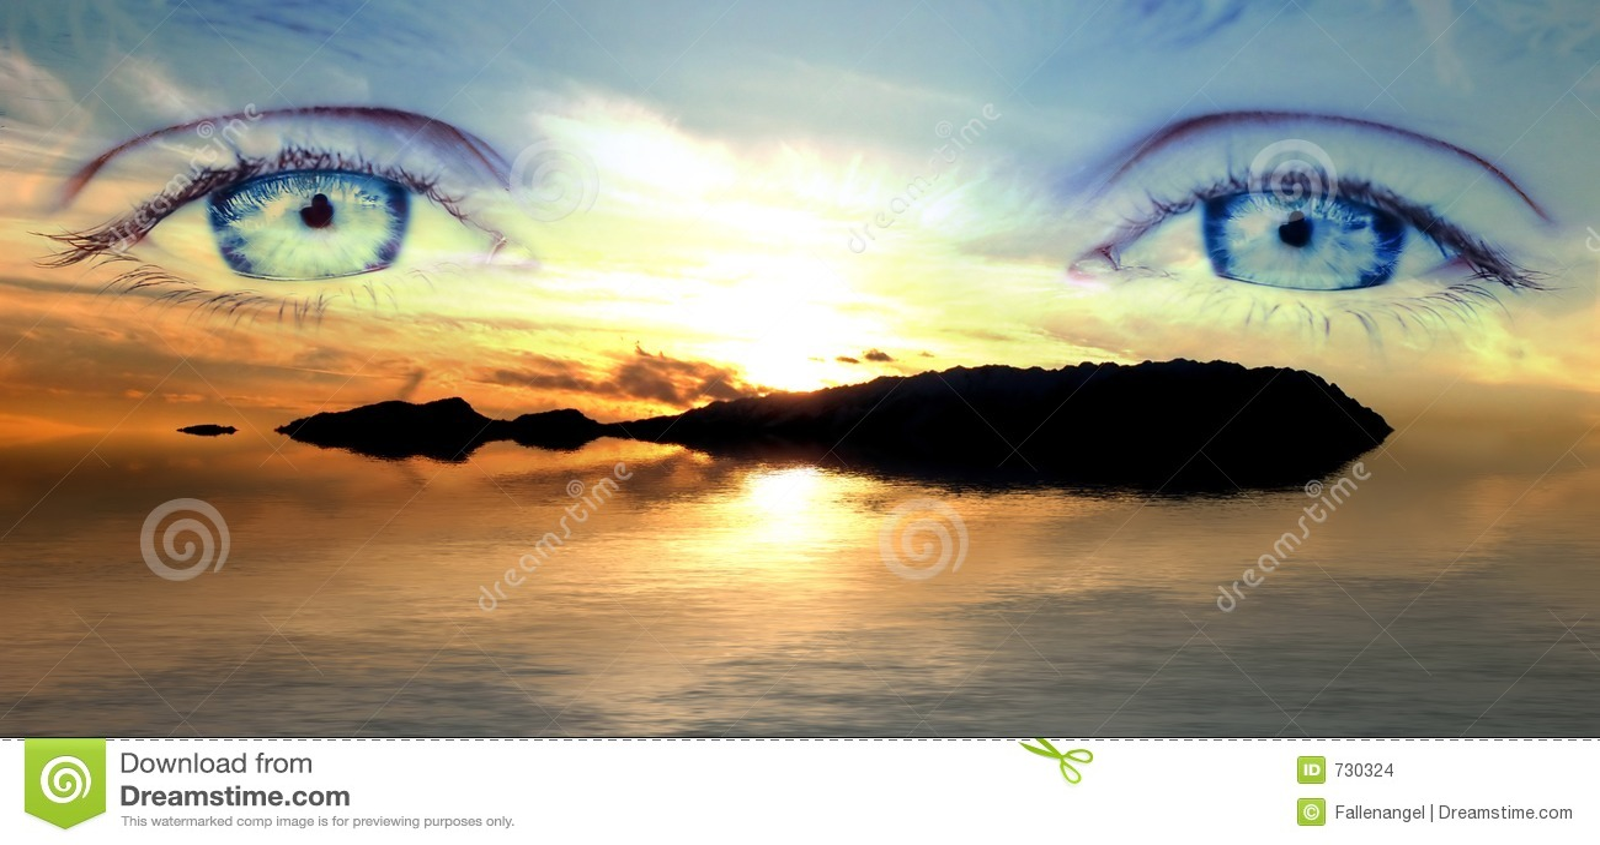 Landscepe de œil bleu